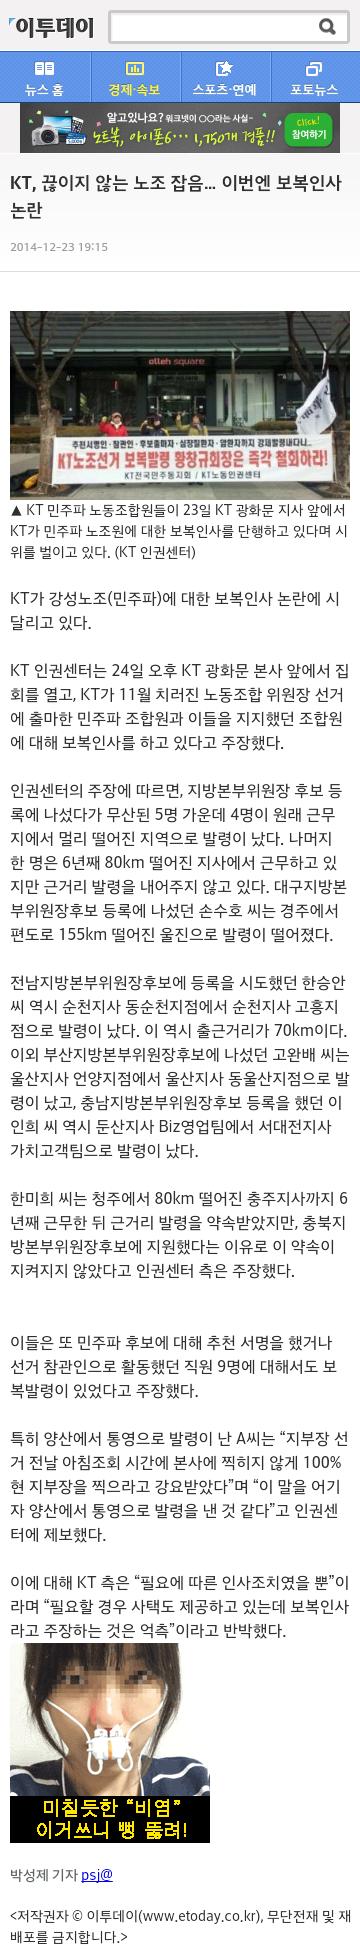 KT노조선거 보복발령 보도기사(20141223이투데이).png